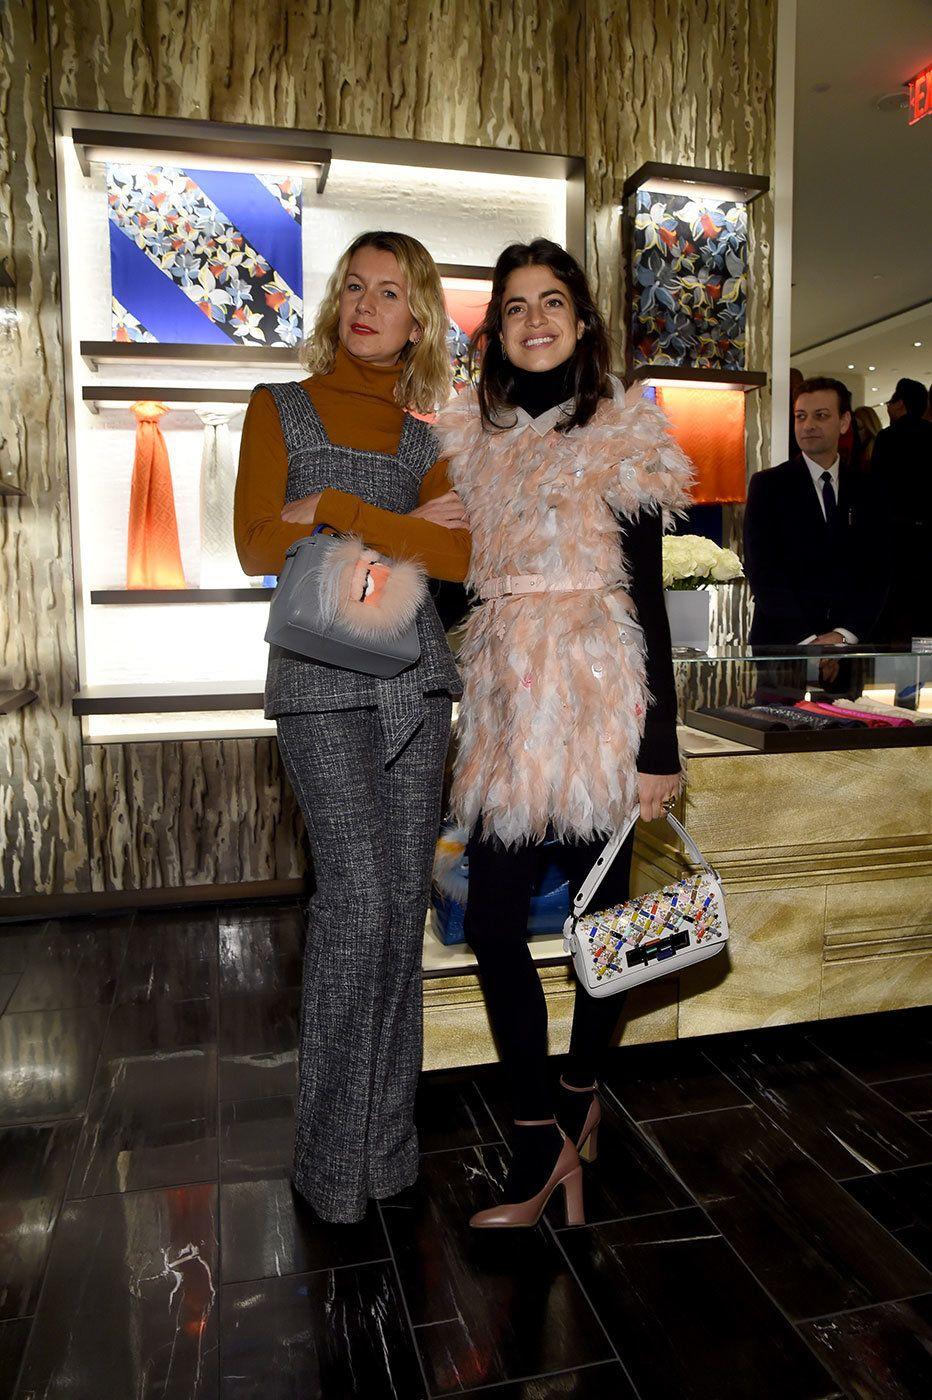 Karl Lagerfeld and Silvia Venturini Fendi Celebrate Fendi's New 3Baguette Charity Initiative – Vogue